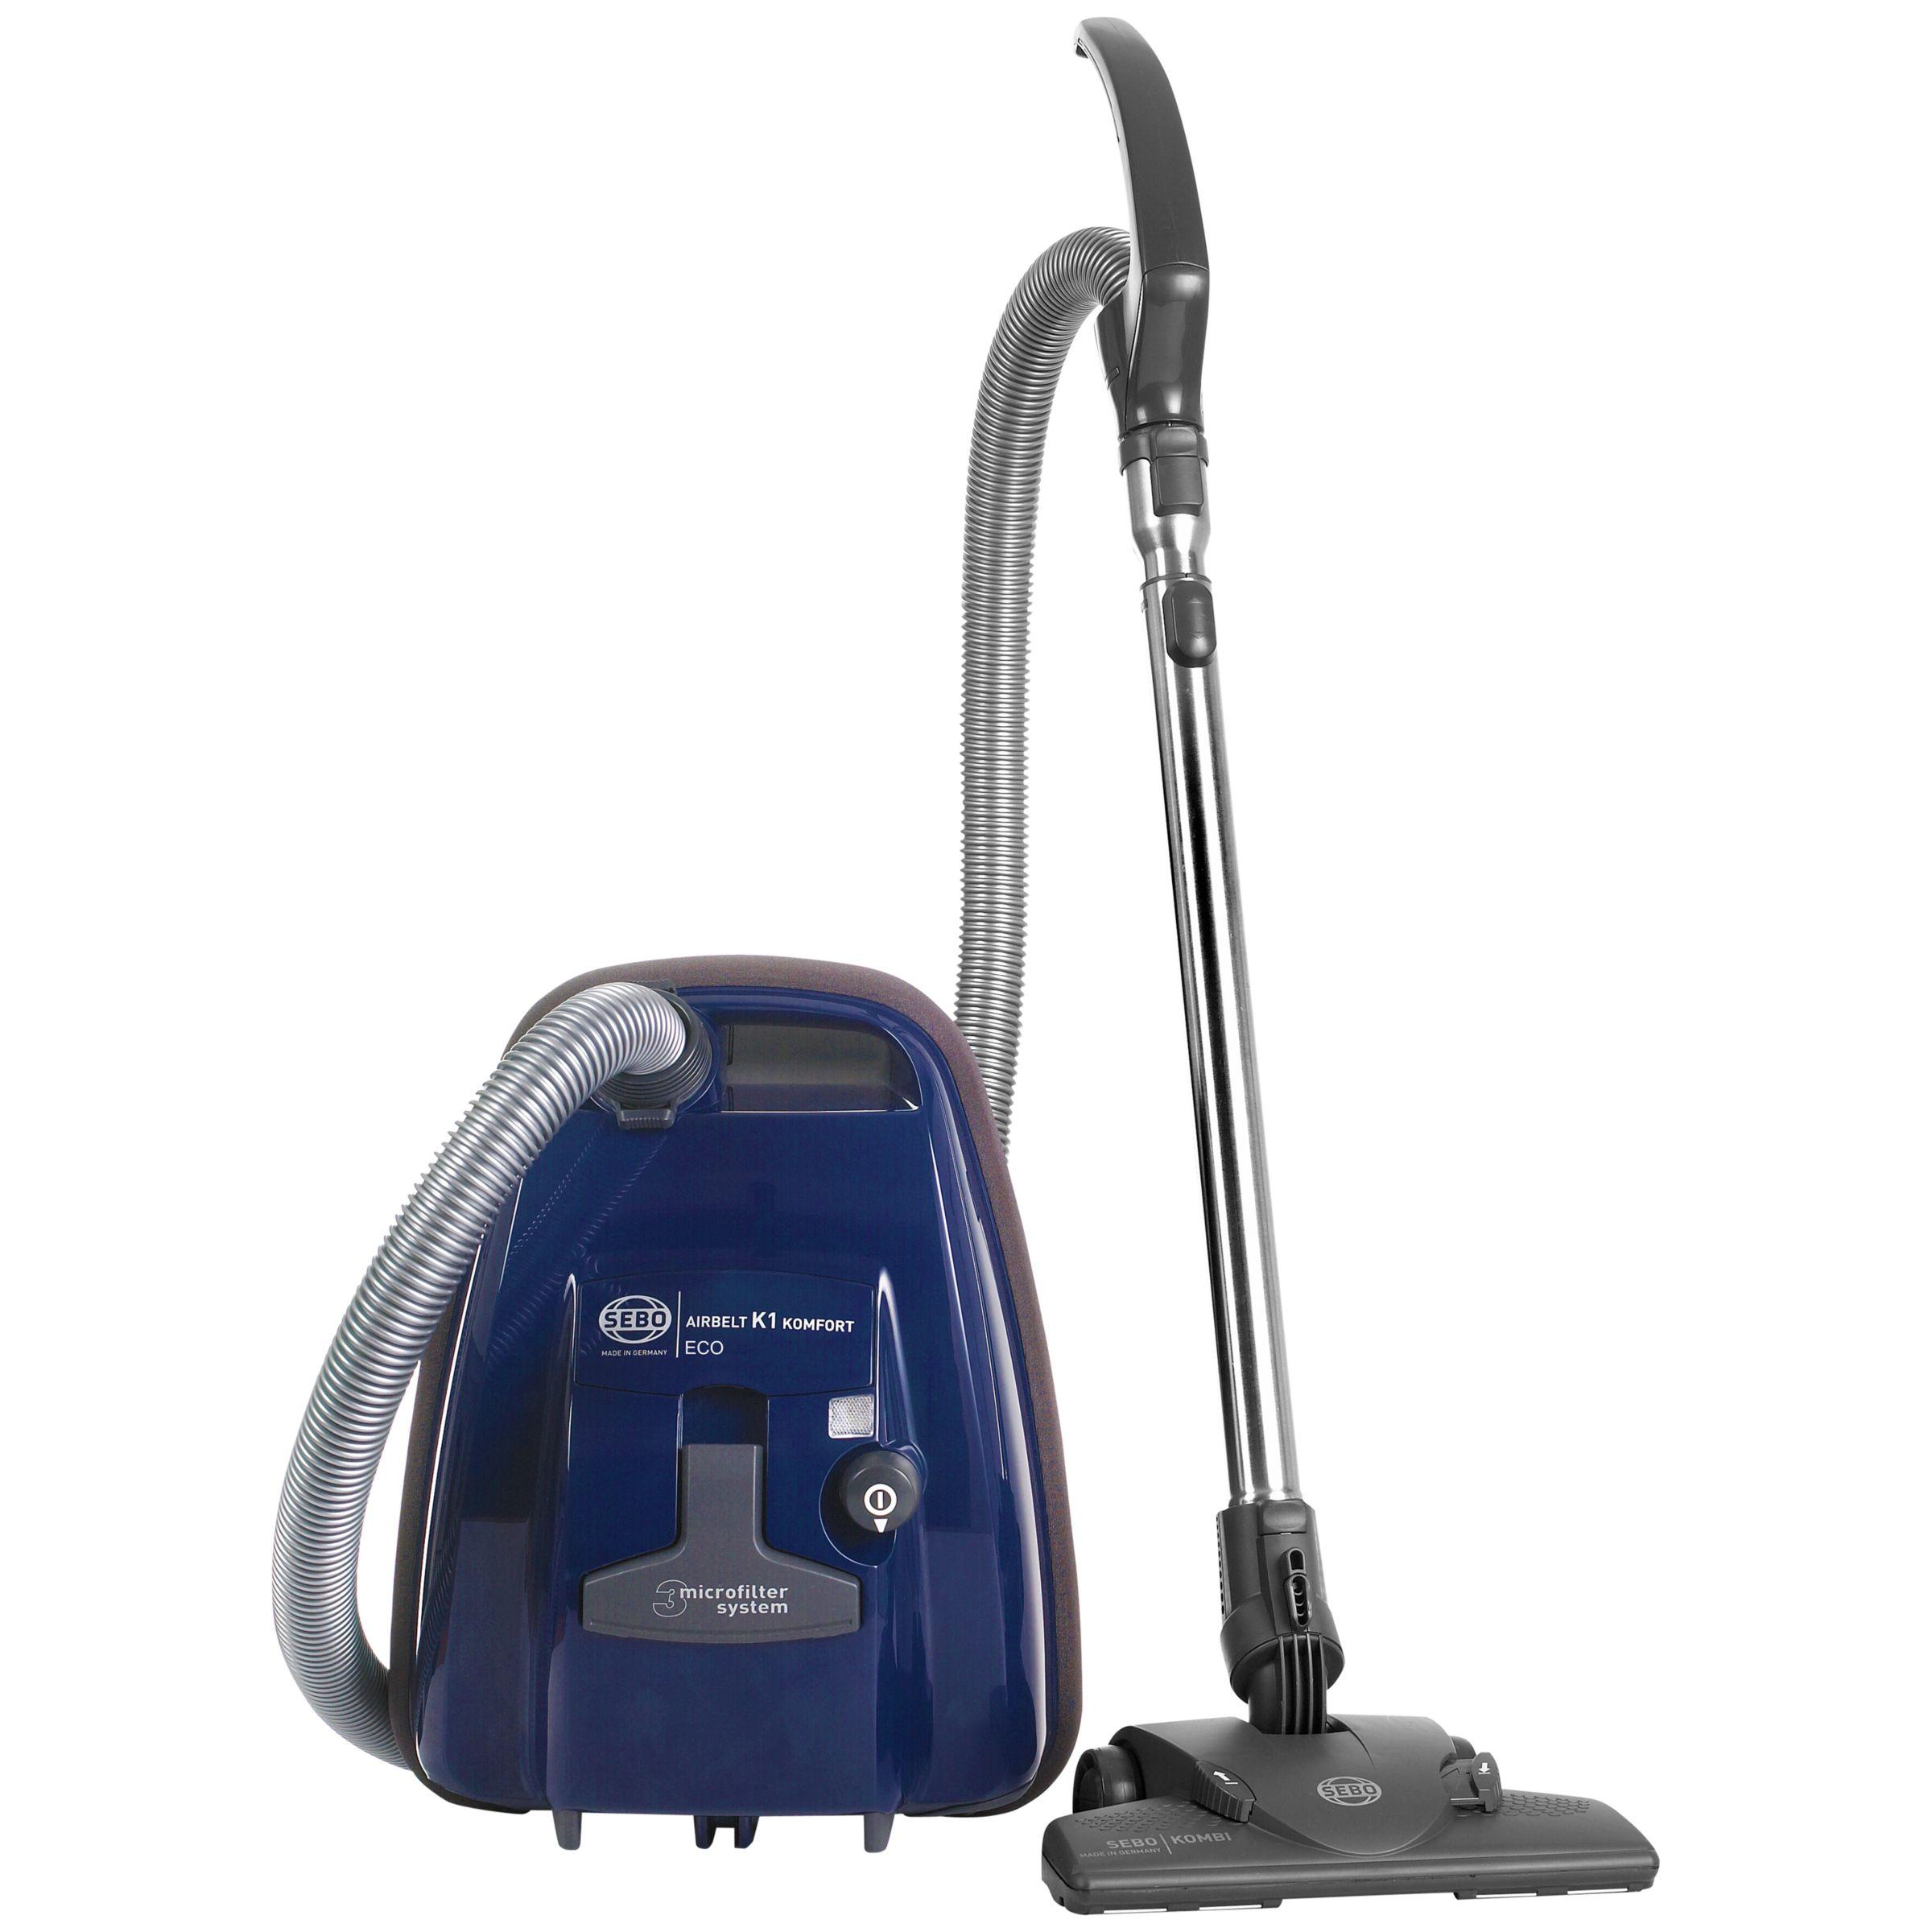 Sebo Sebo K1 Komfort Eco Cylinder Vacuum Cleaner, Blue